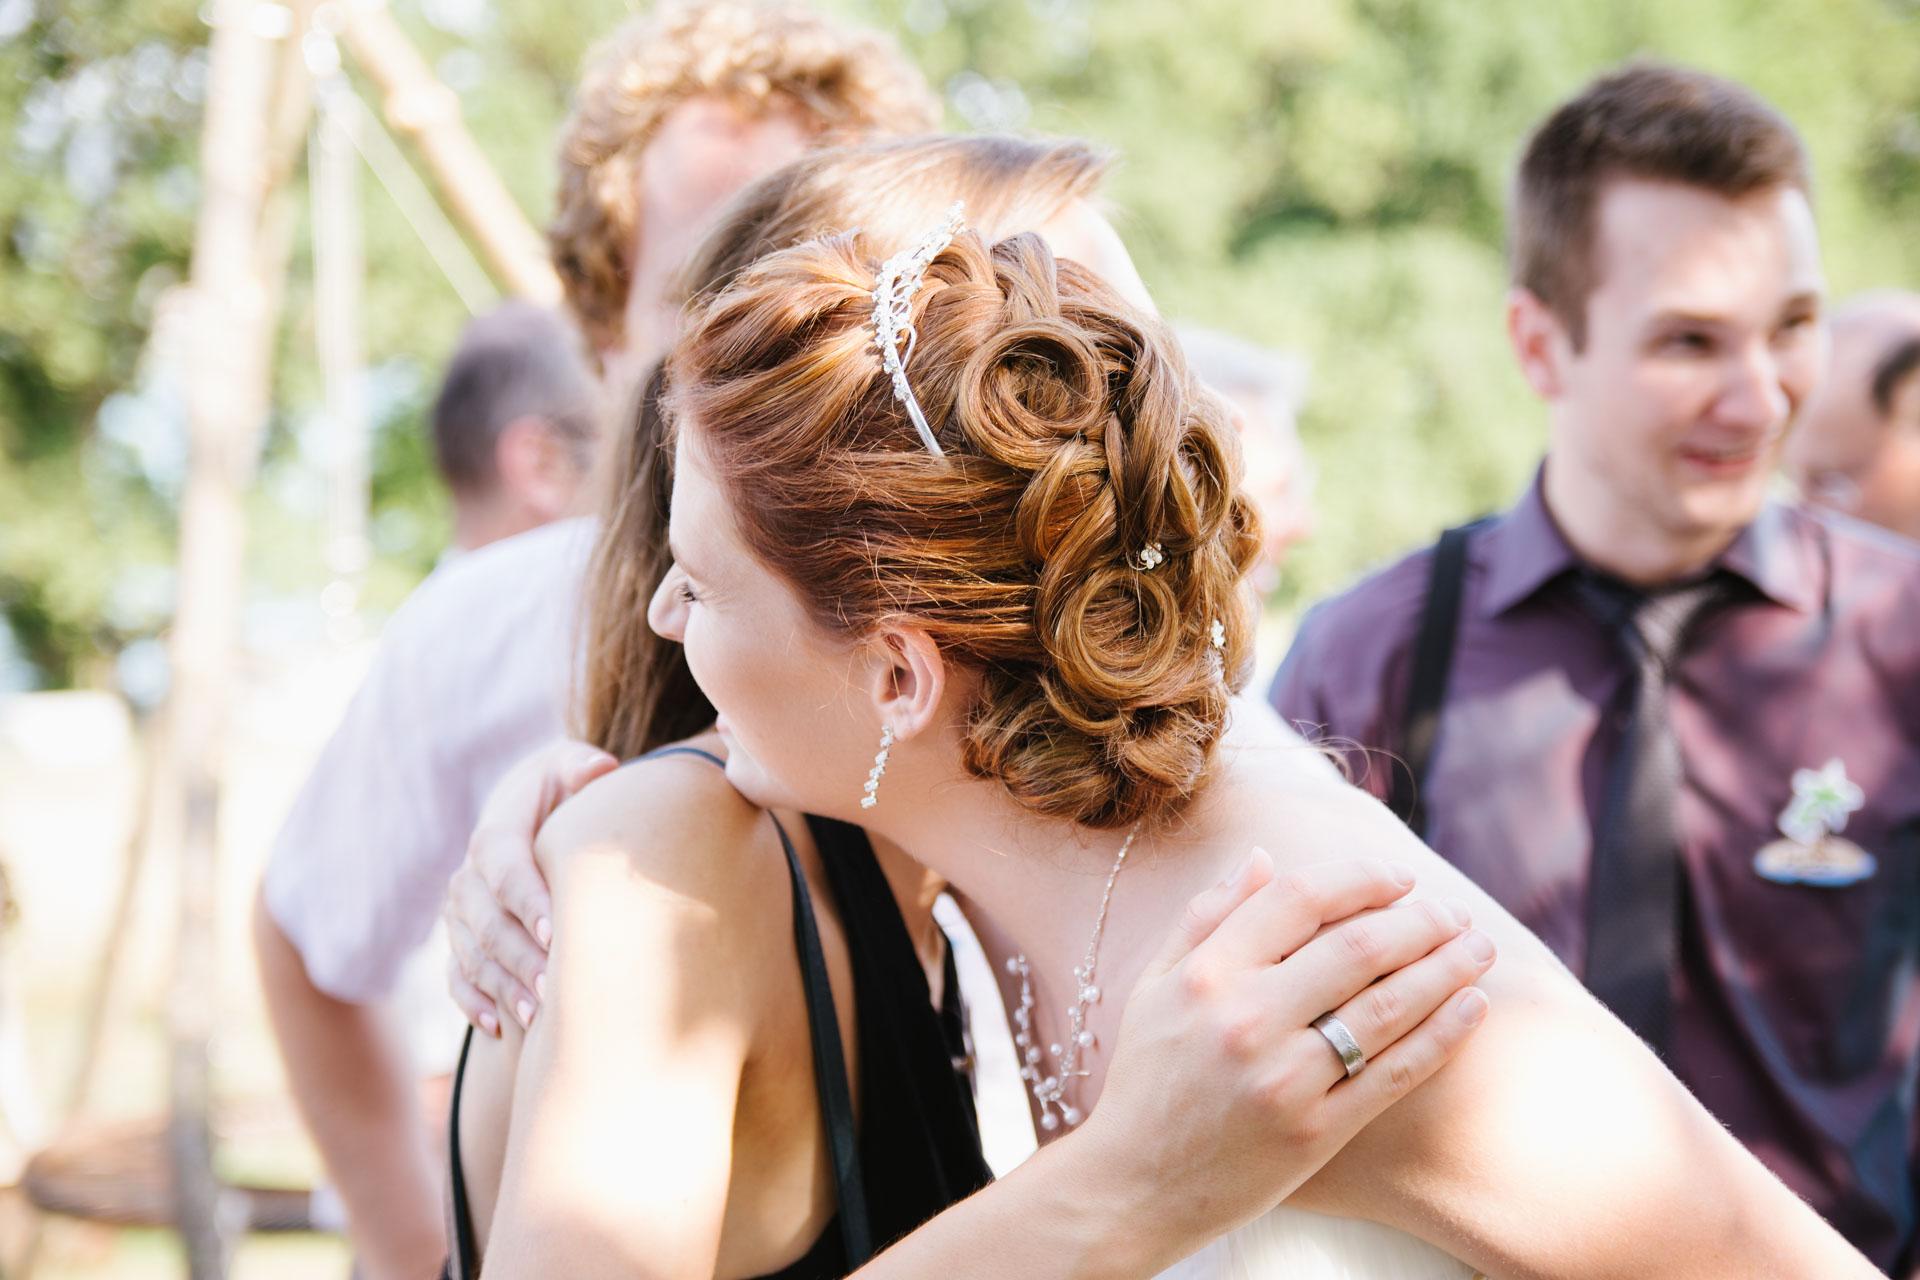 Pixelart_Hochzeitsfotografen_Loerrach_Rheinfelden_Hallwil_Schweiz_Linda-Ramon-1043